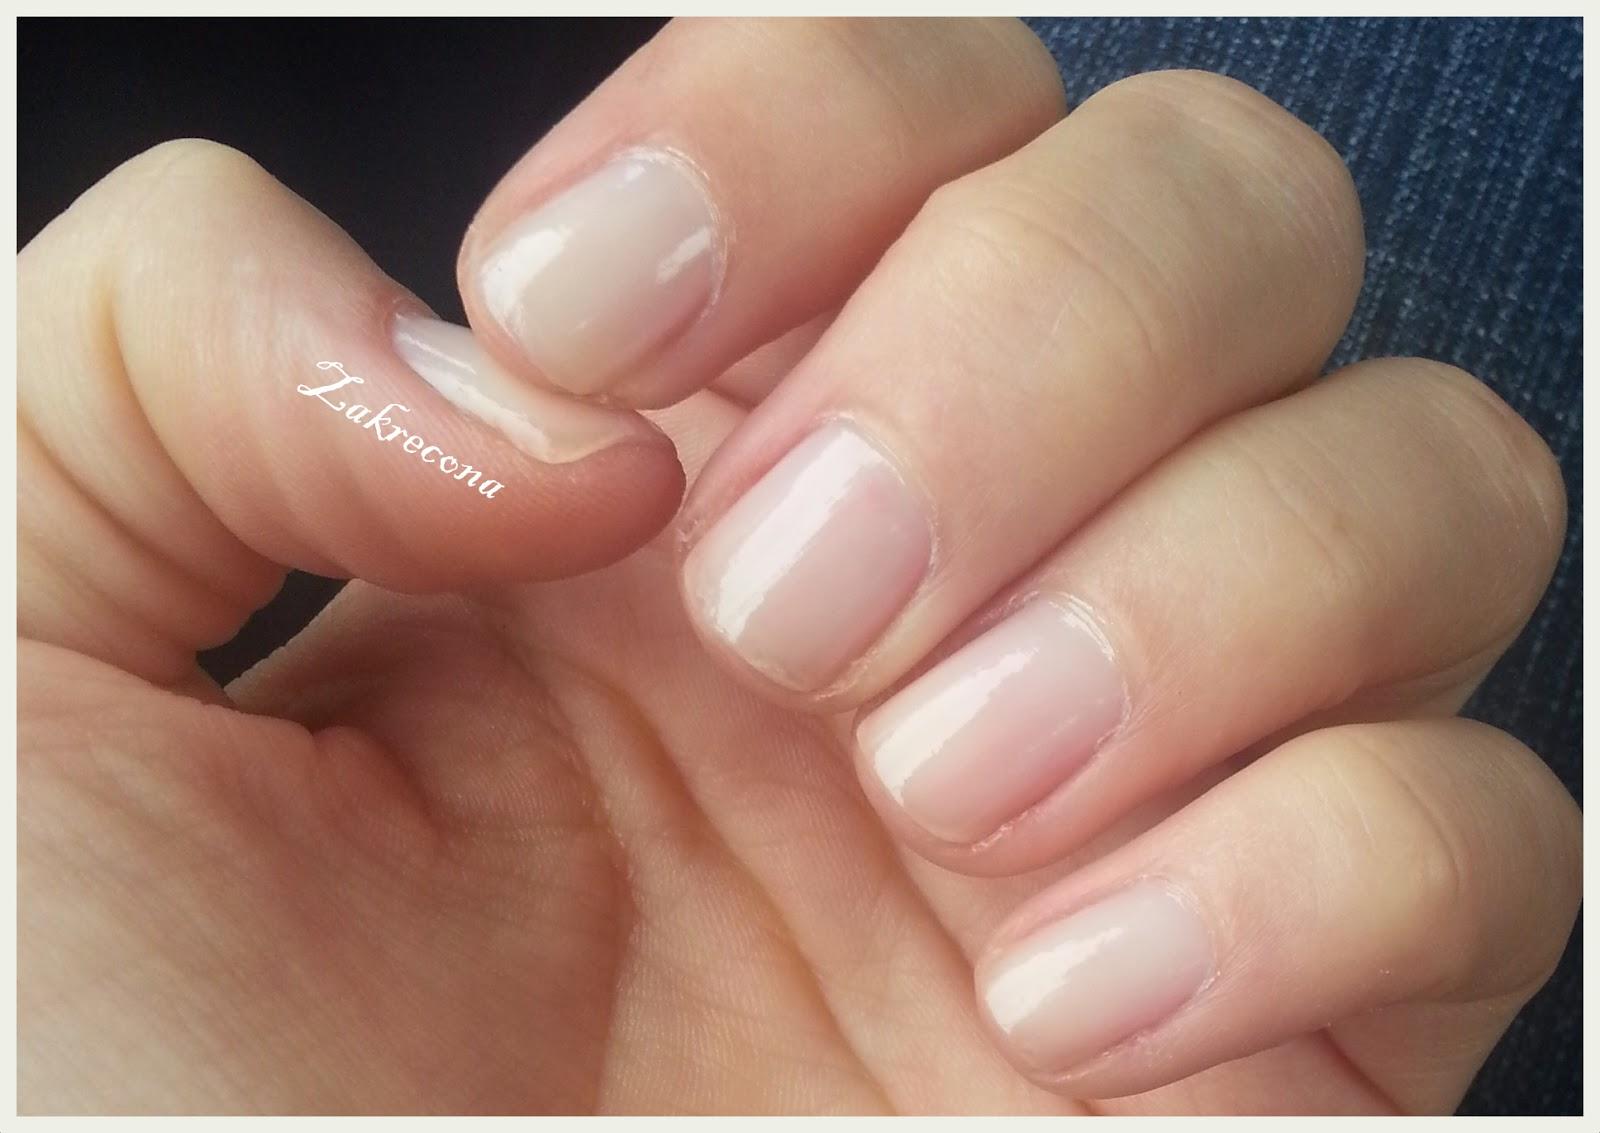 sposob na zdrowe paznokcie